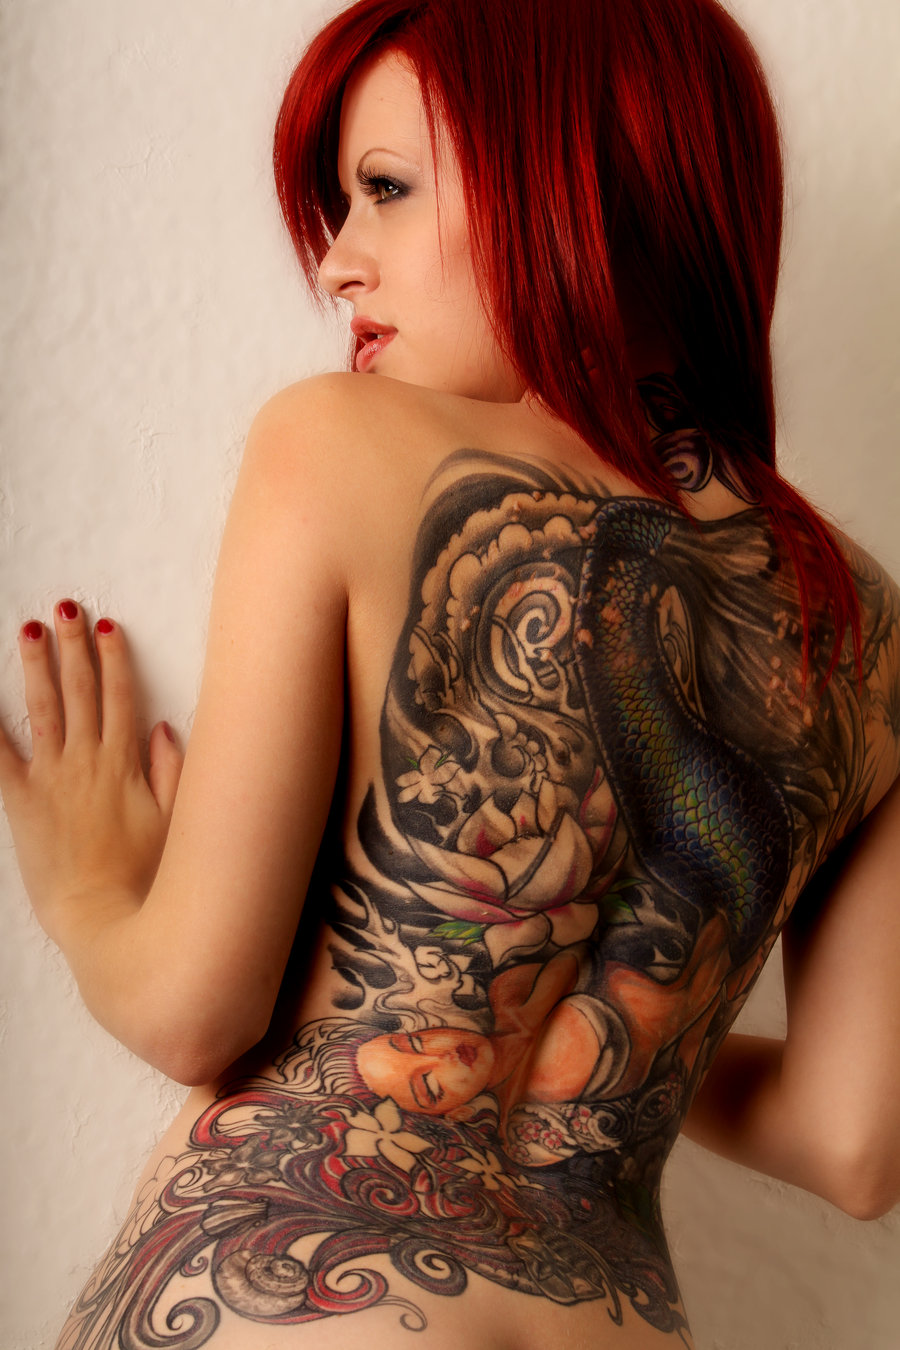 Chica sexy con tattoos movimientos sexys 1